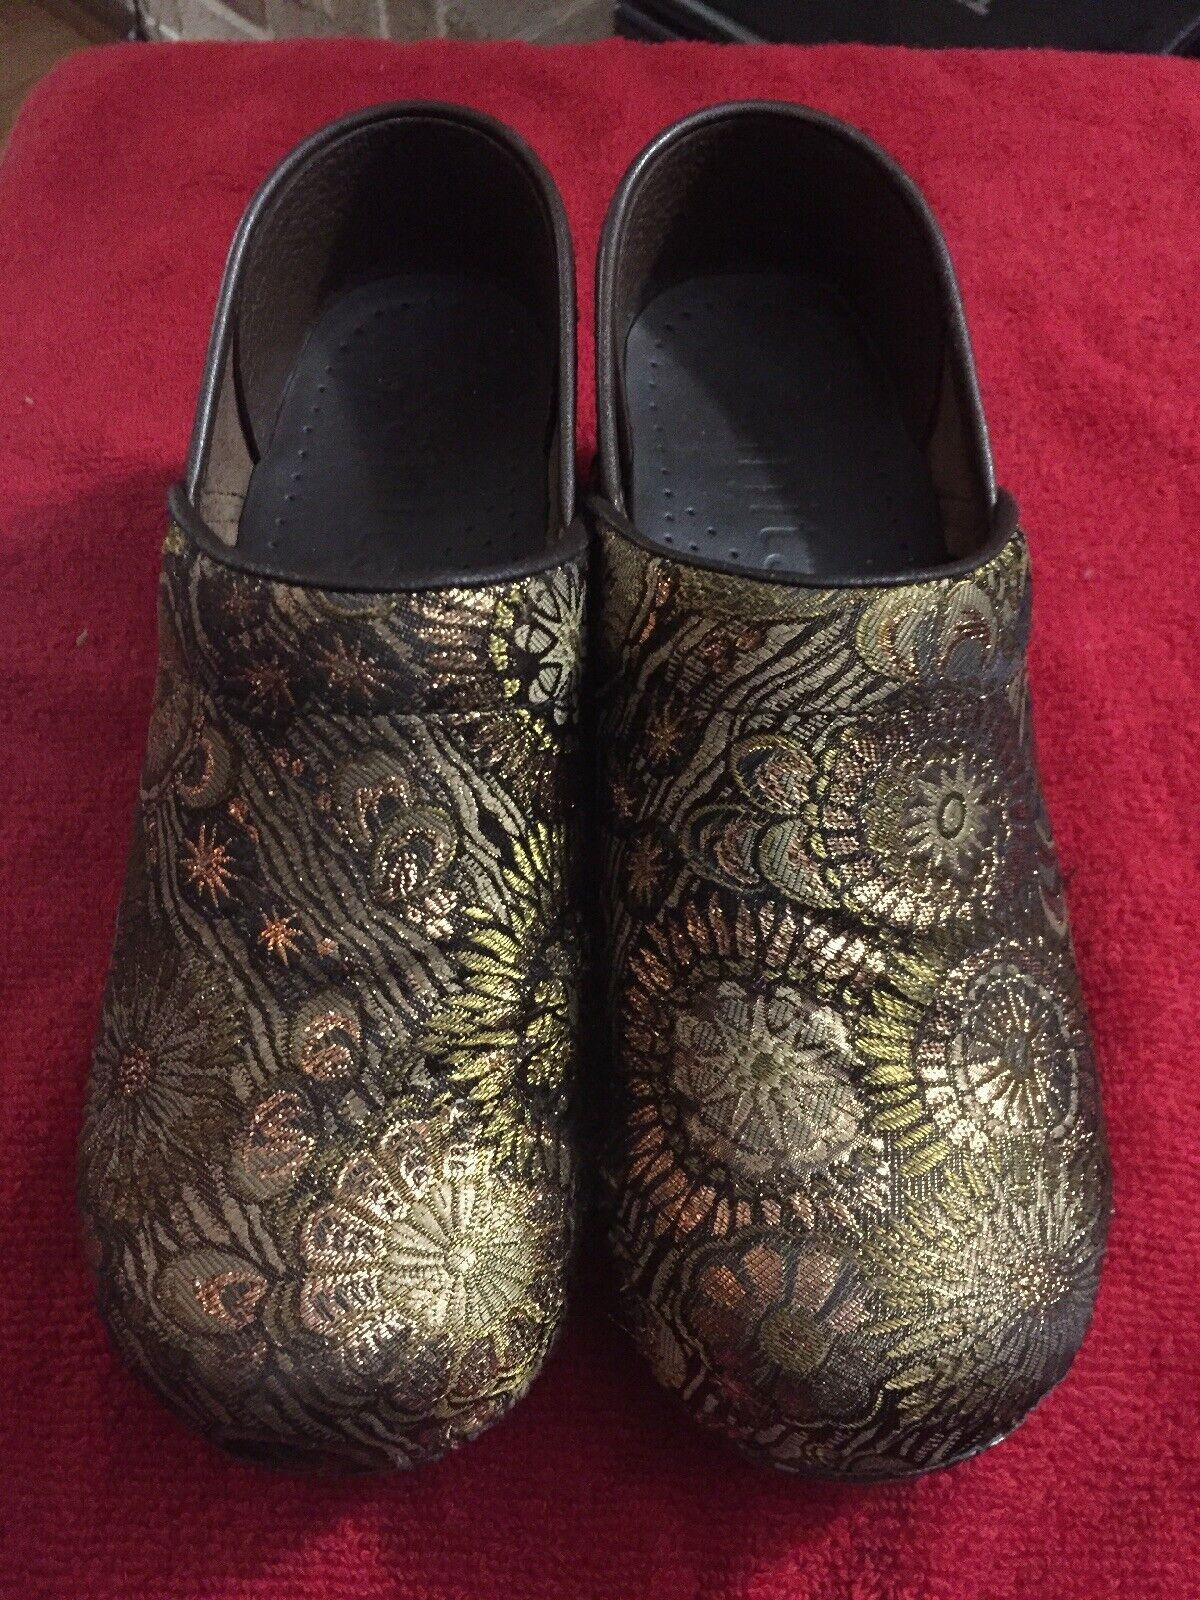 Sanita Womens Floral Patterned Brown 37 Eur Sz 6 US Stapled Clogs Comfort Shoes